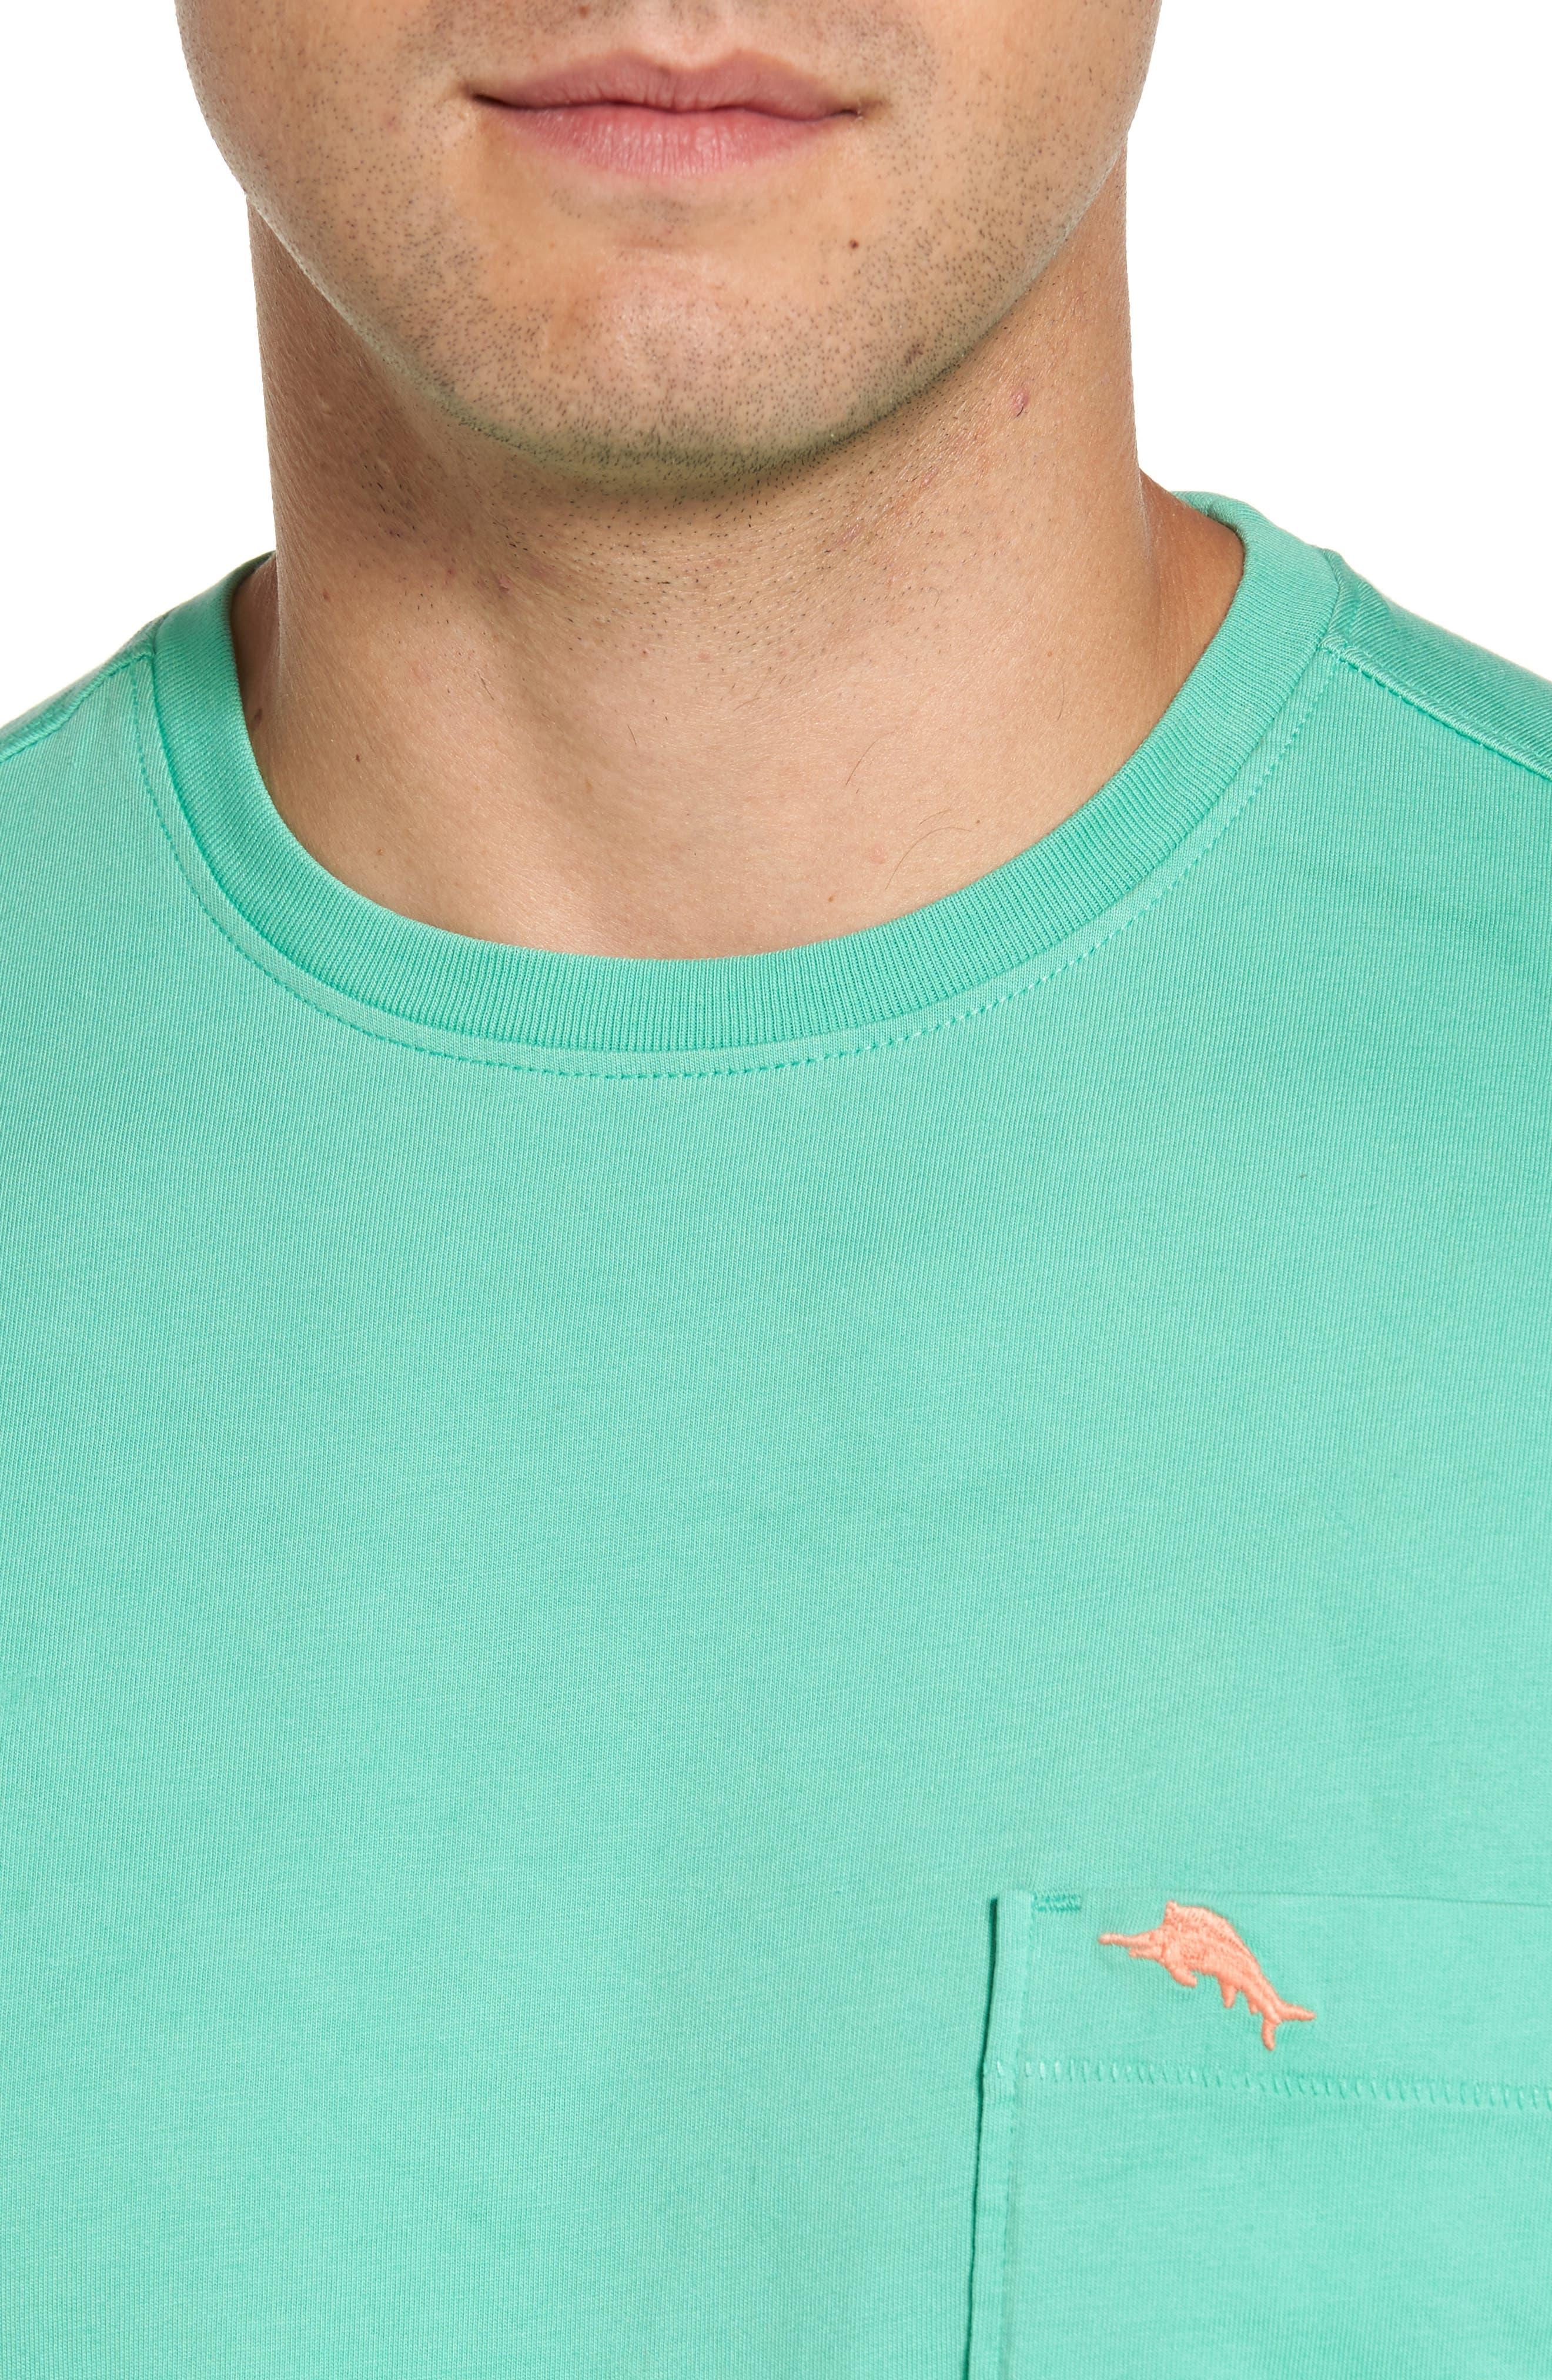 Bali Skyline Pocket T-Shirt,                             Alternate thumbnail 4, color,                             300